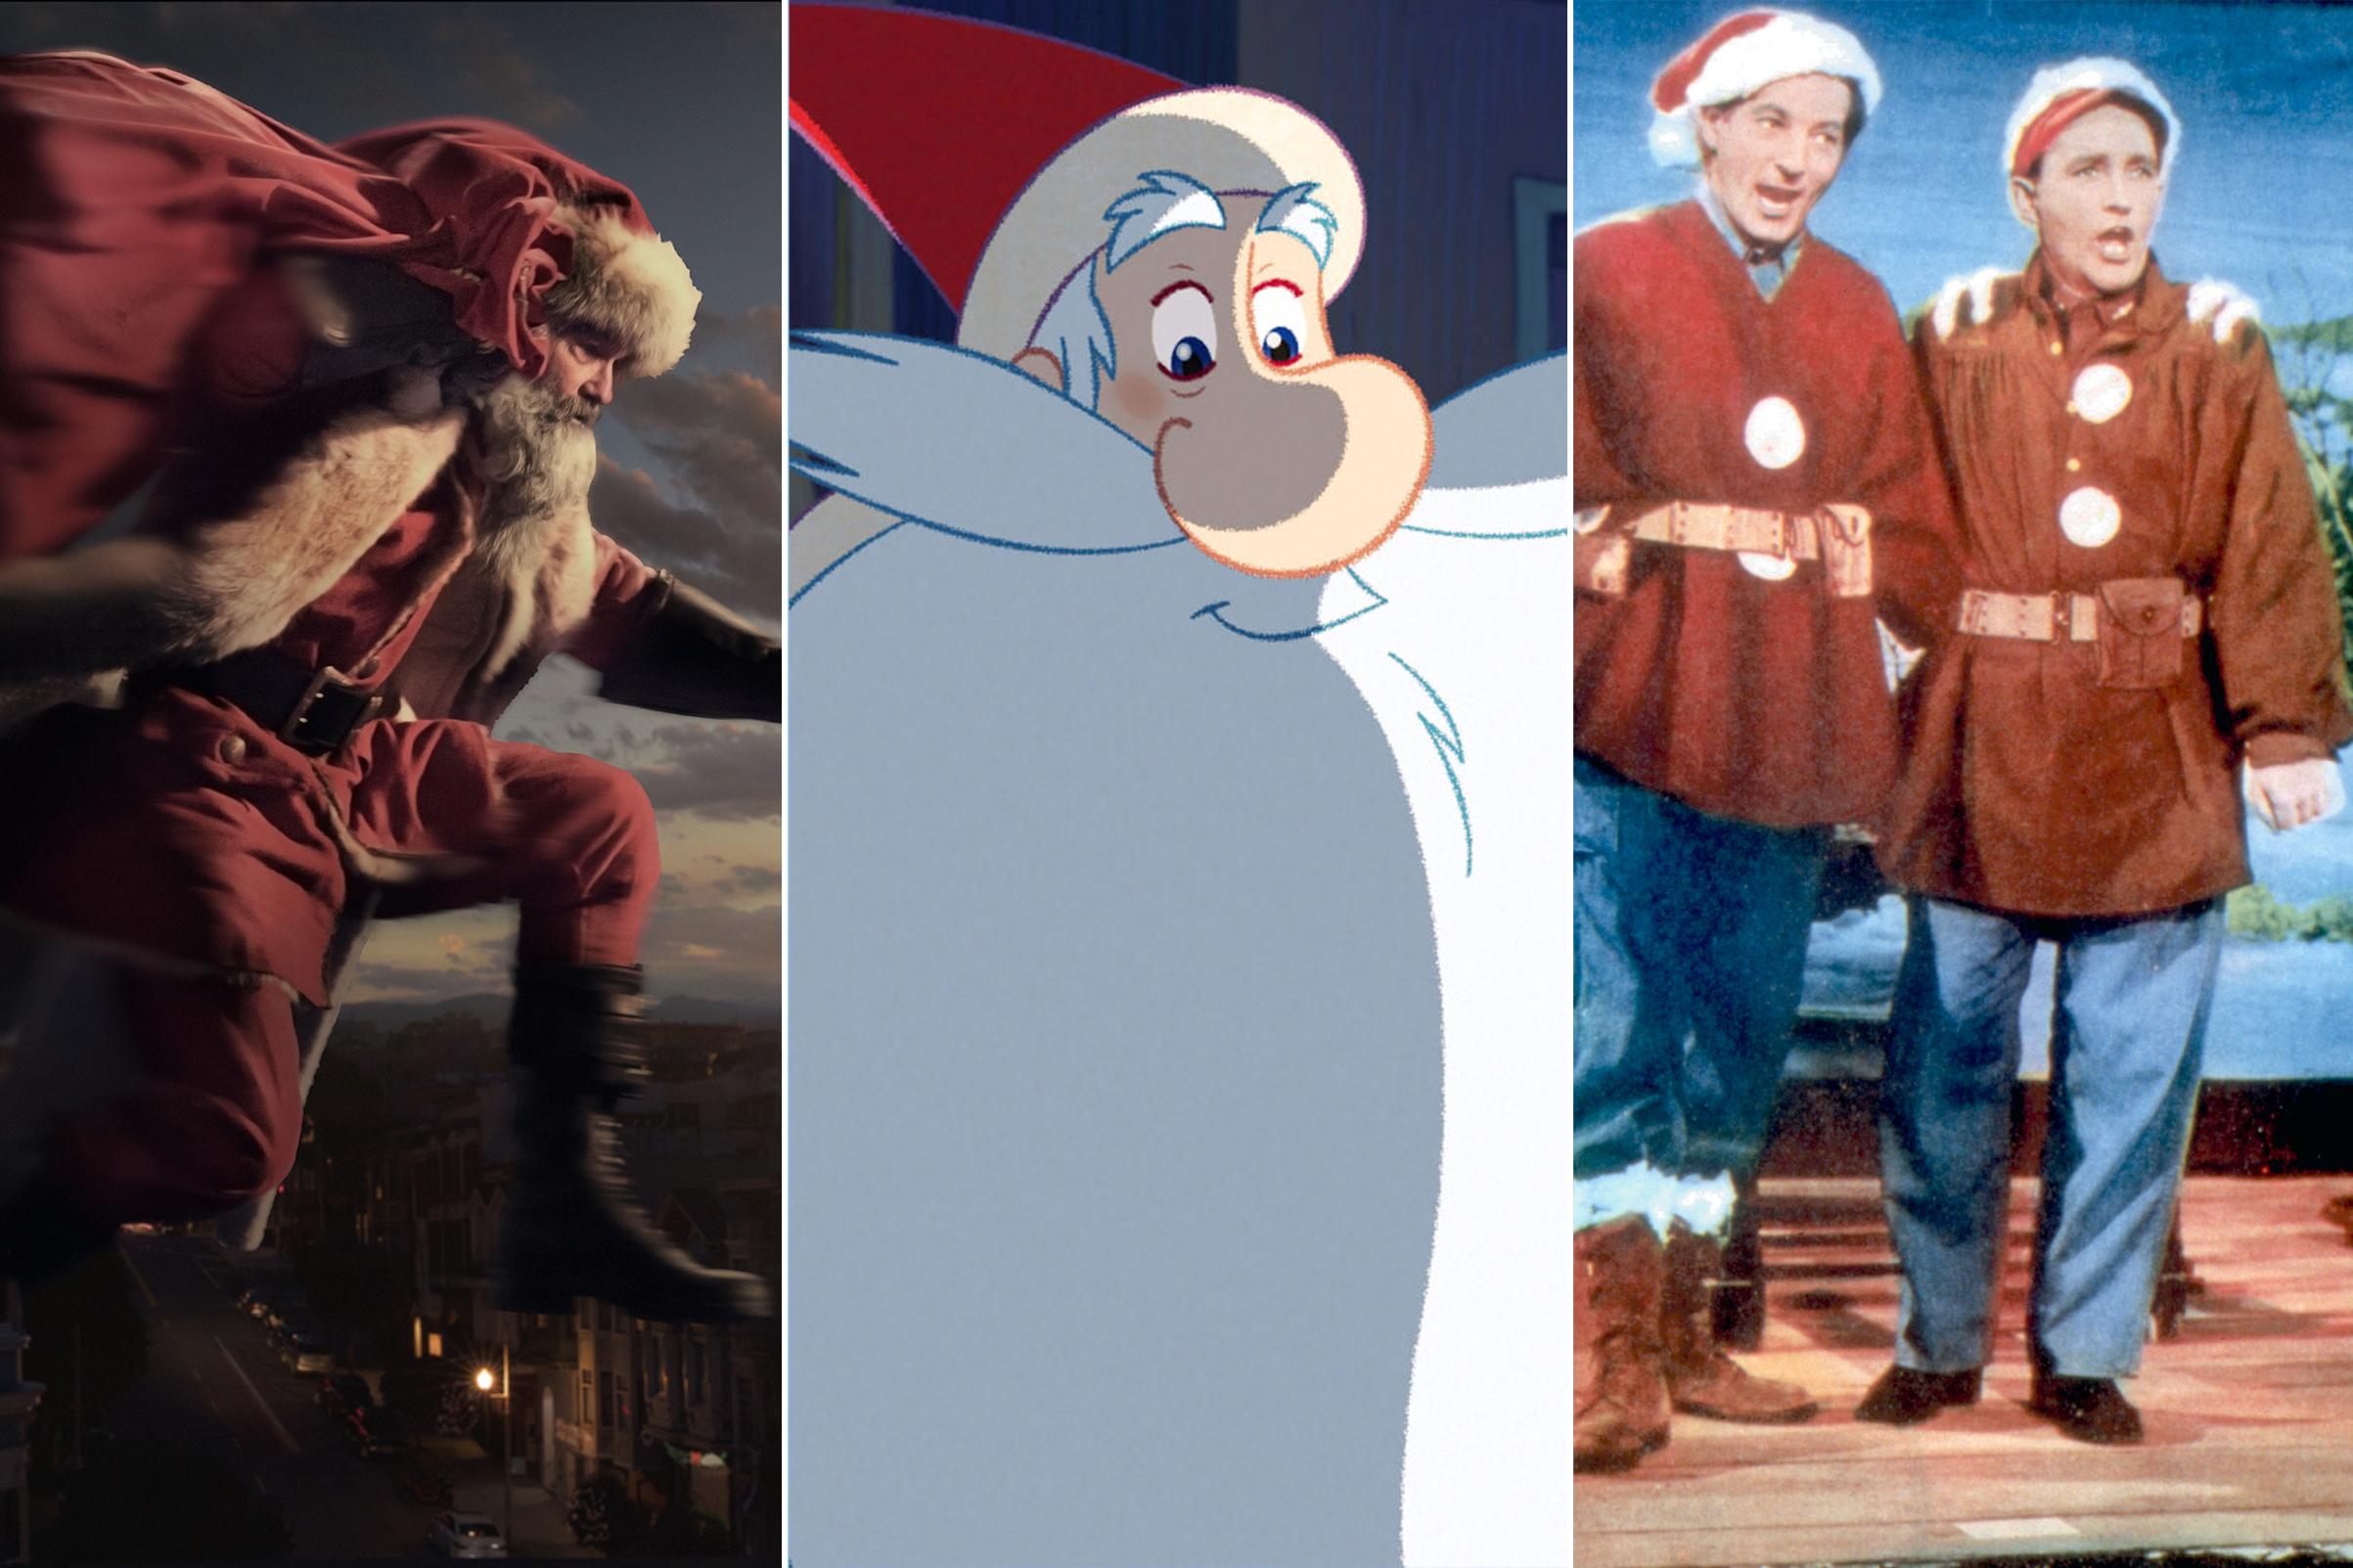 Angela Nicholas Movies 10 best christmas kid movies on netflix | time